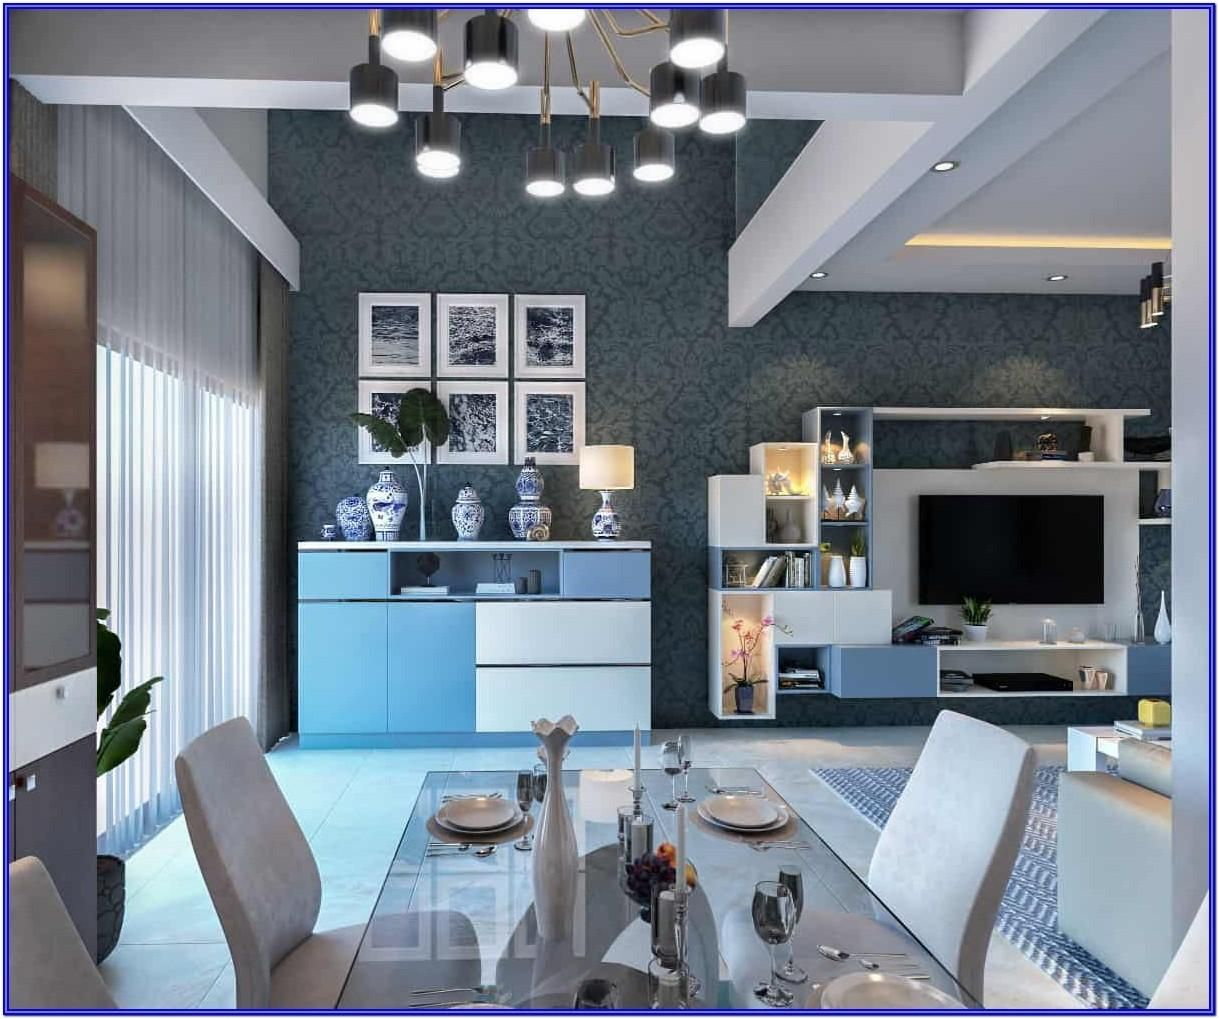 Living Hall Interior Design: Interior Design Ideas For Living Room Bangalore By Steven